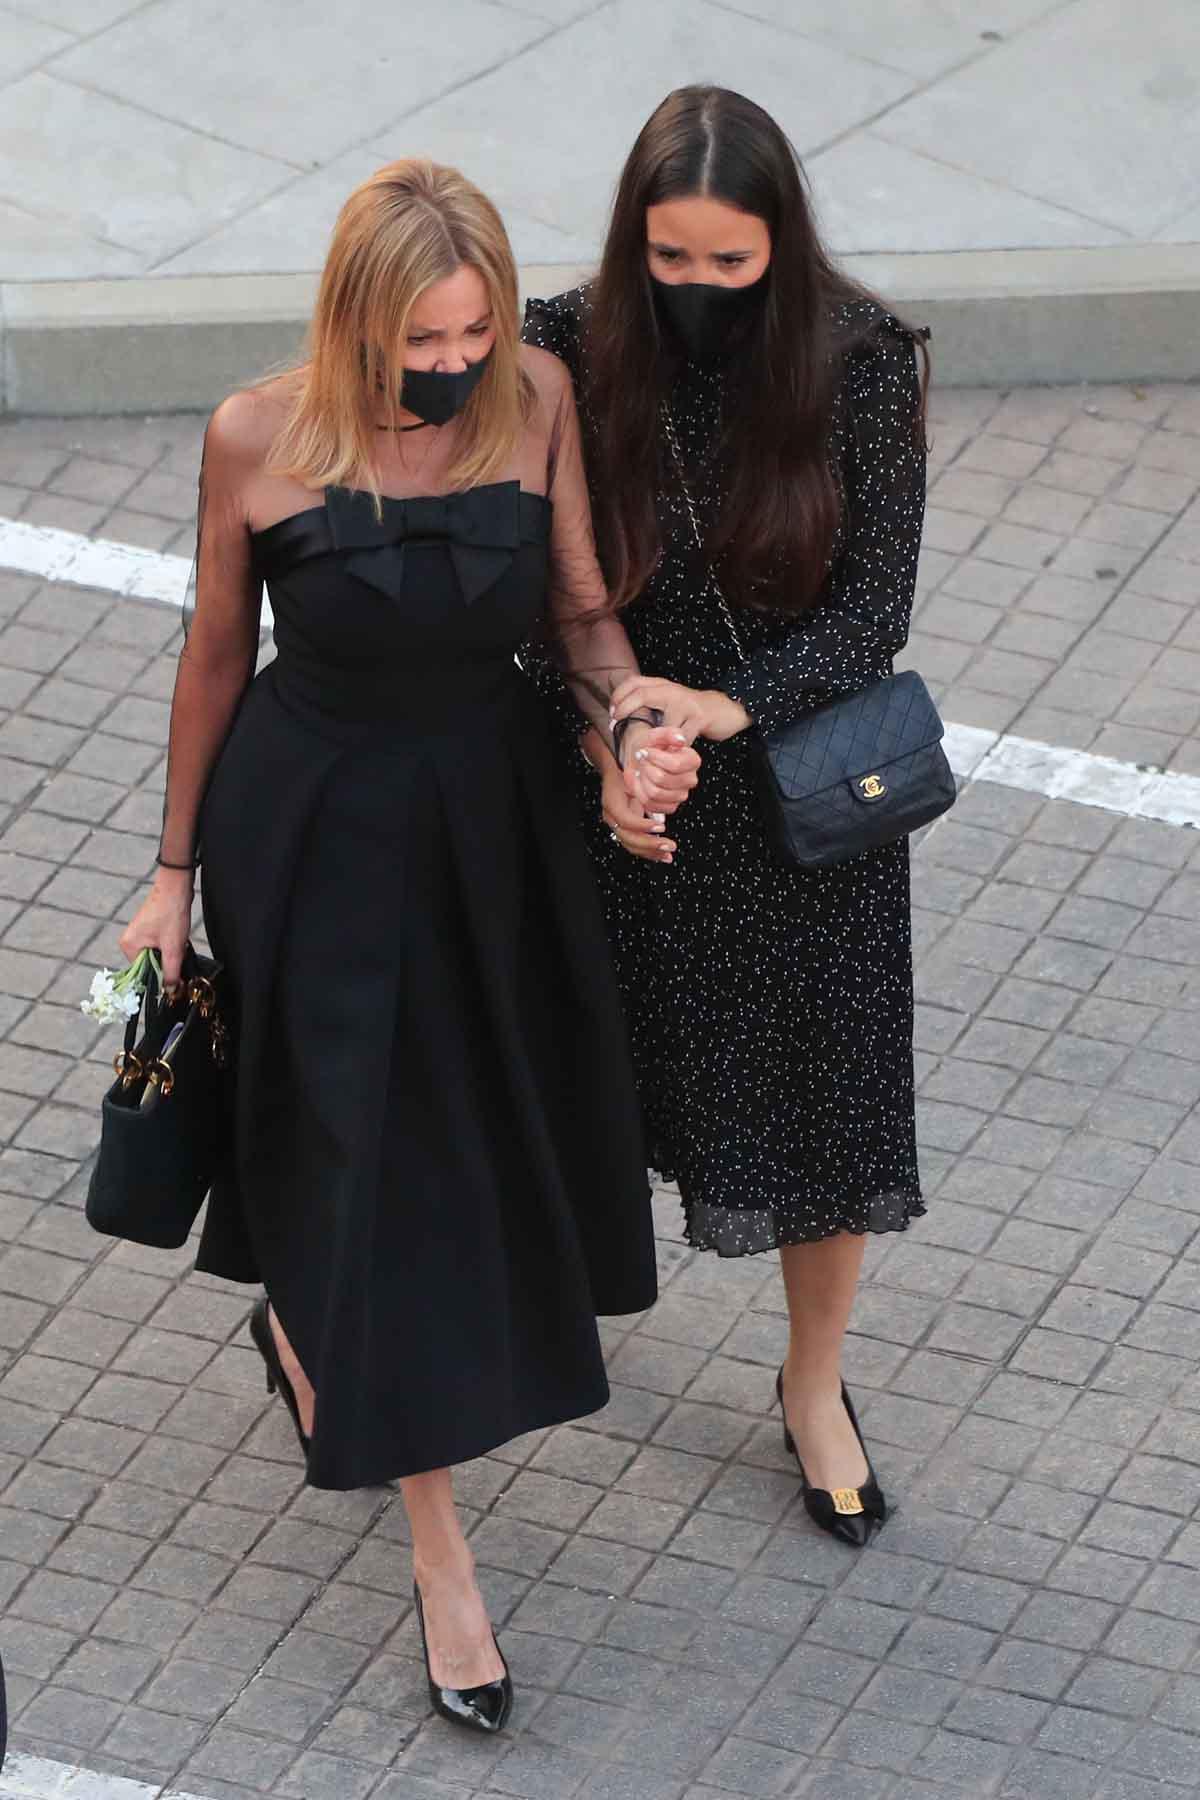 Ana Obregón junto a Carolina Monje, novia de Álex Lequio, en el día del funeral del joven / GTRES